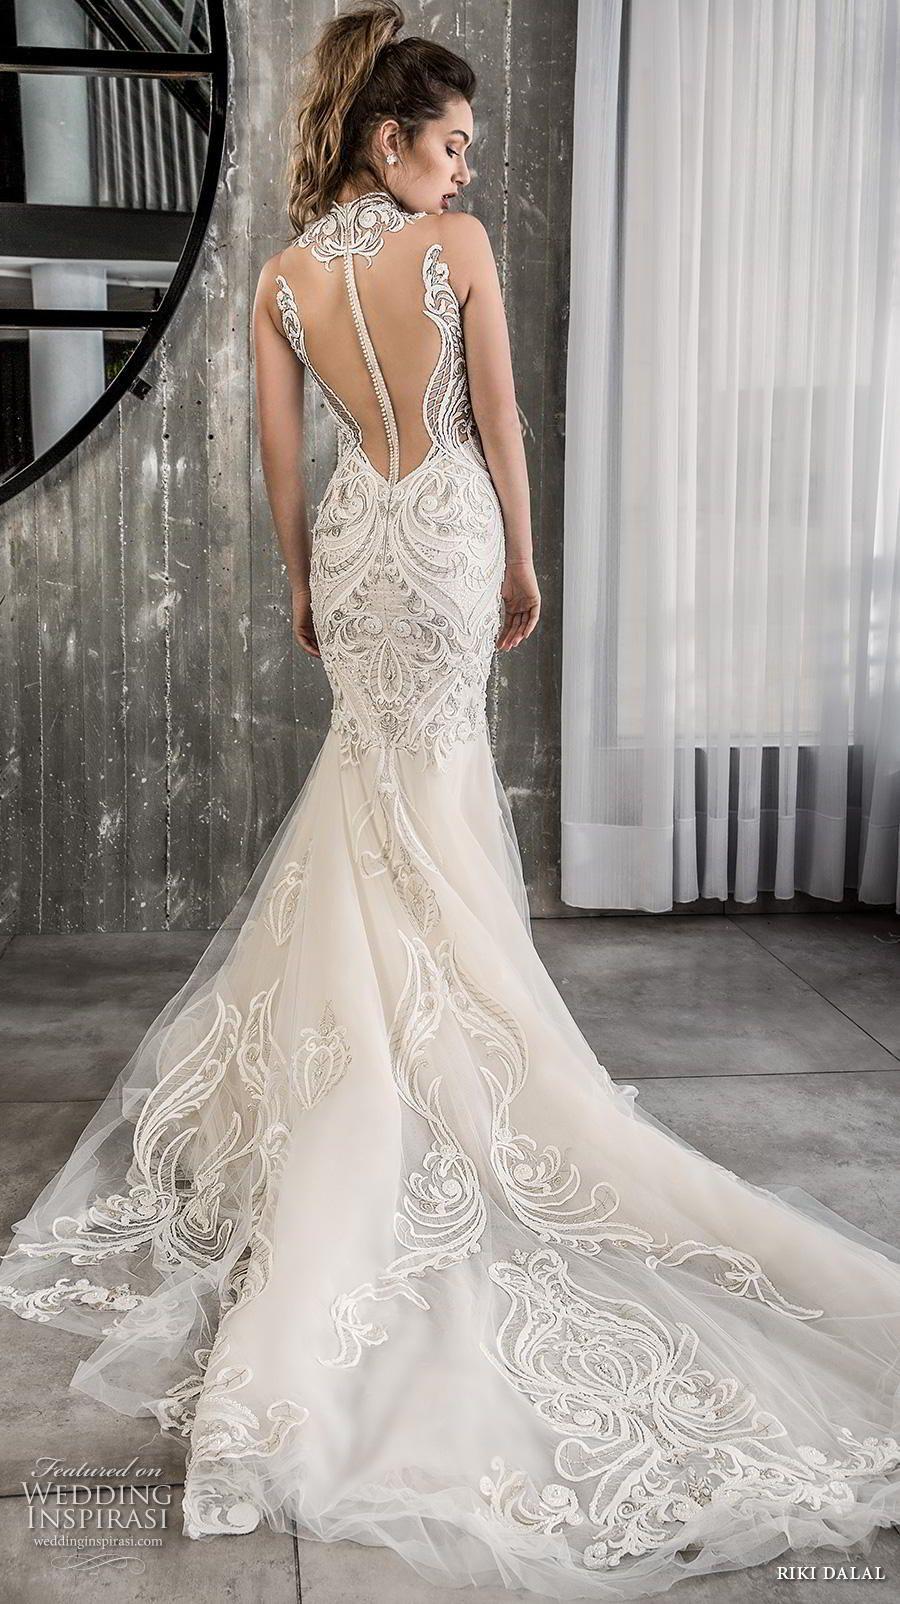 Riki Dalal 2018 Wedding Dresses Glamour Bridal Collection Wedding Inspirasi Wedding Dresses Lace Wedding Dresses Lace Mermaid Wedding Dress [ 1604 x 900 Pixel ]